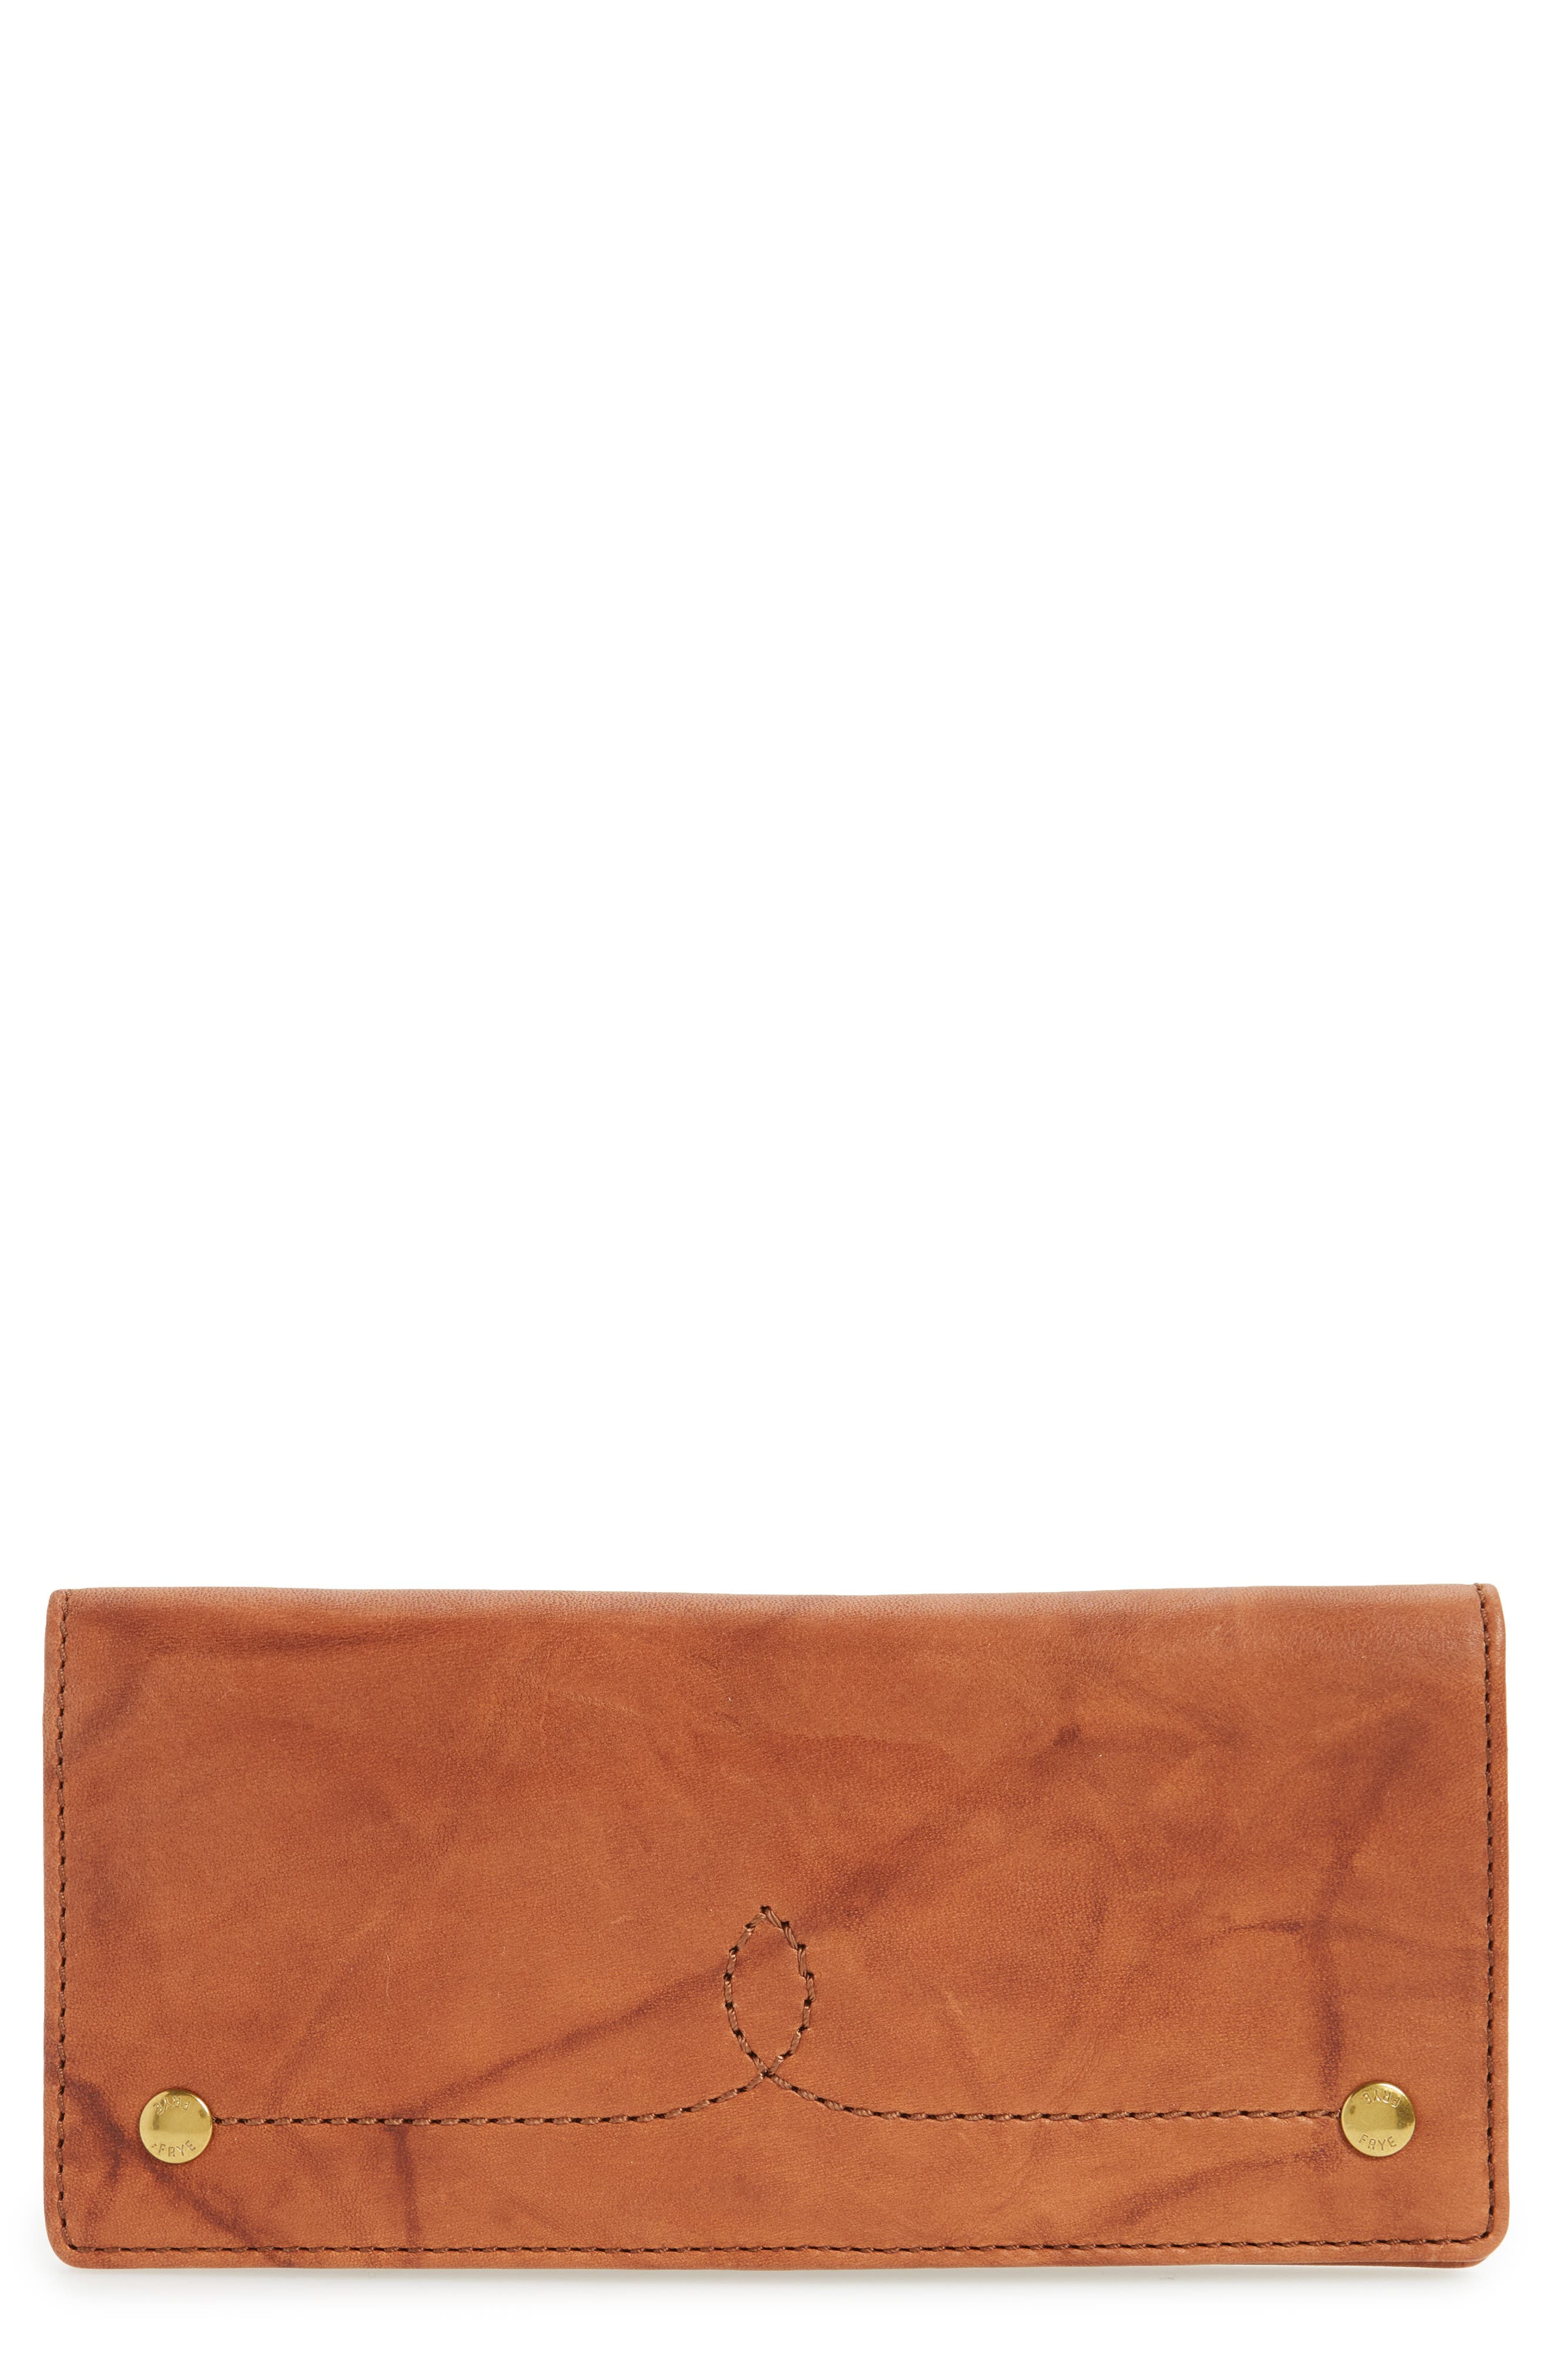 Campus Rivet Slim Leather Wallet,                         Main,                         color, Saddle